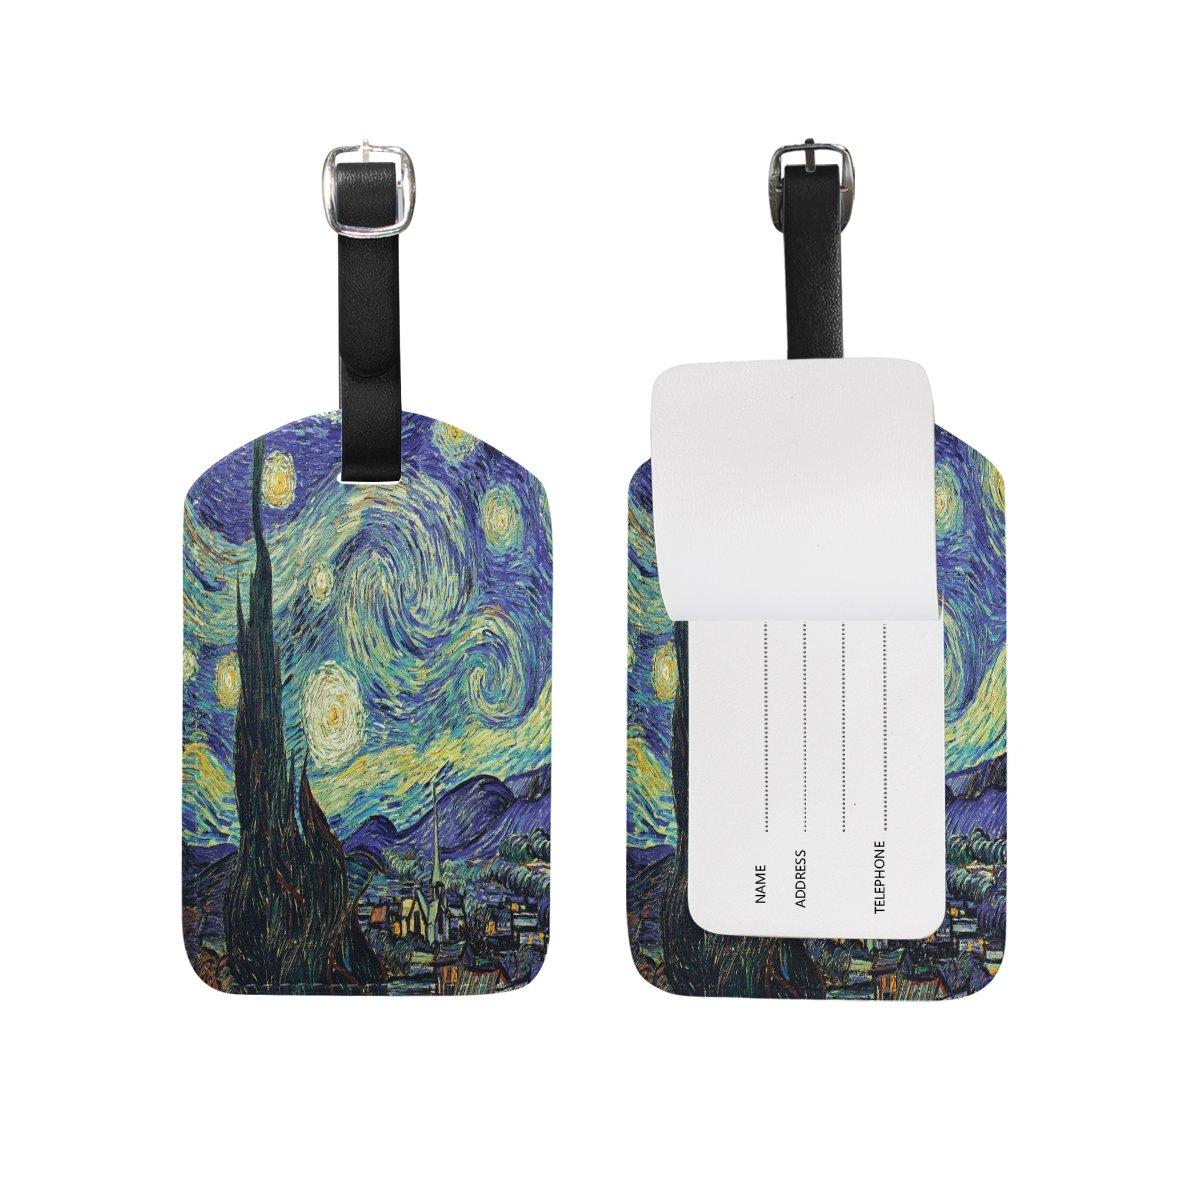 Saobao Travel Luggage Tag Van Gogh's Starry Night PU Leather Baggage Suitcase Travel ID Bag Tag, 1Pcs